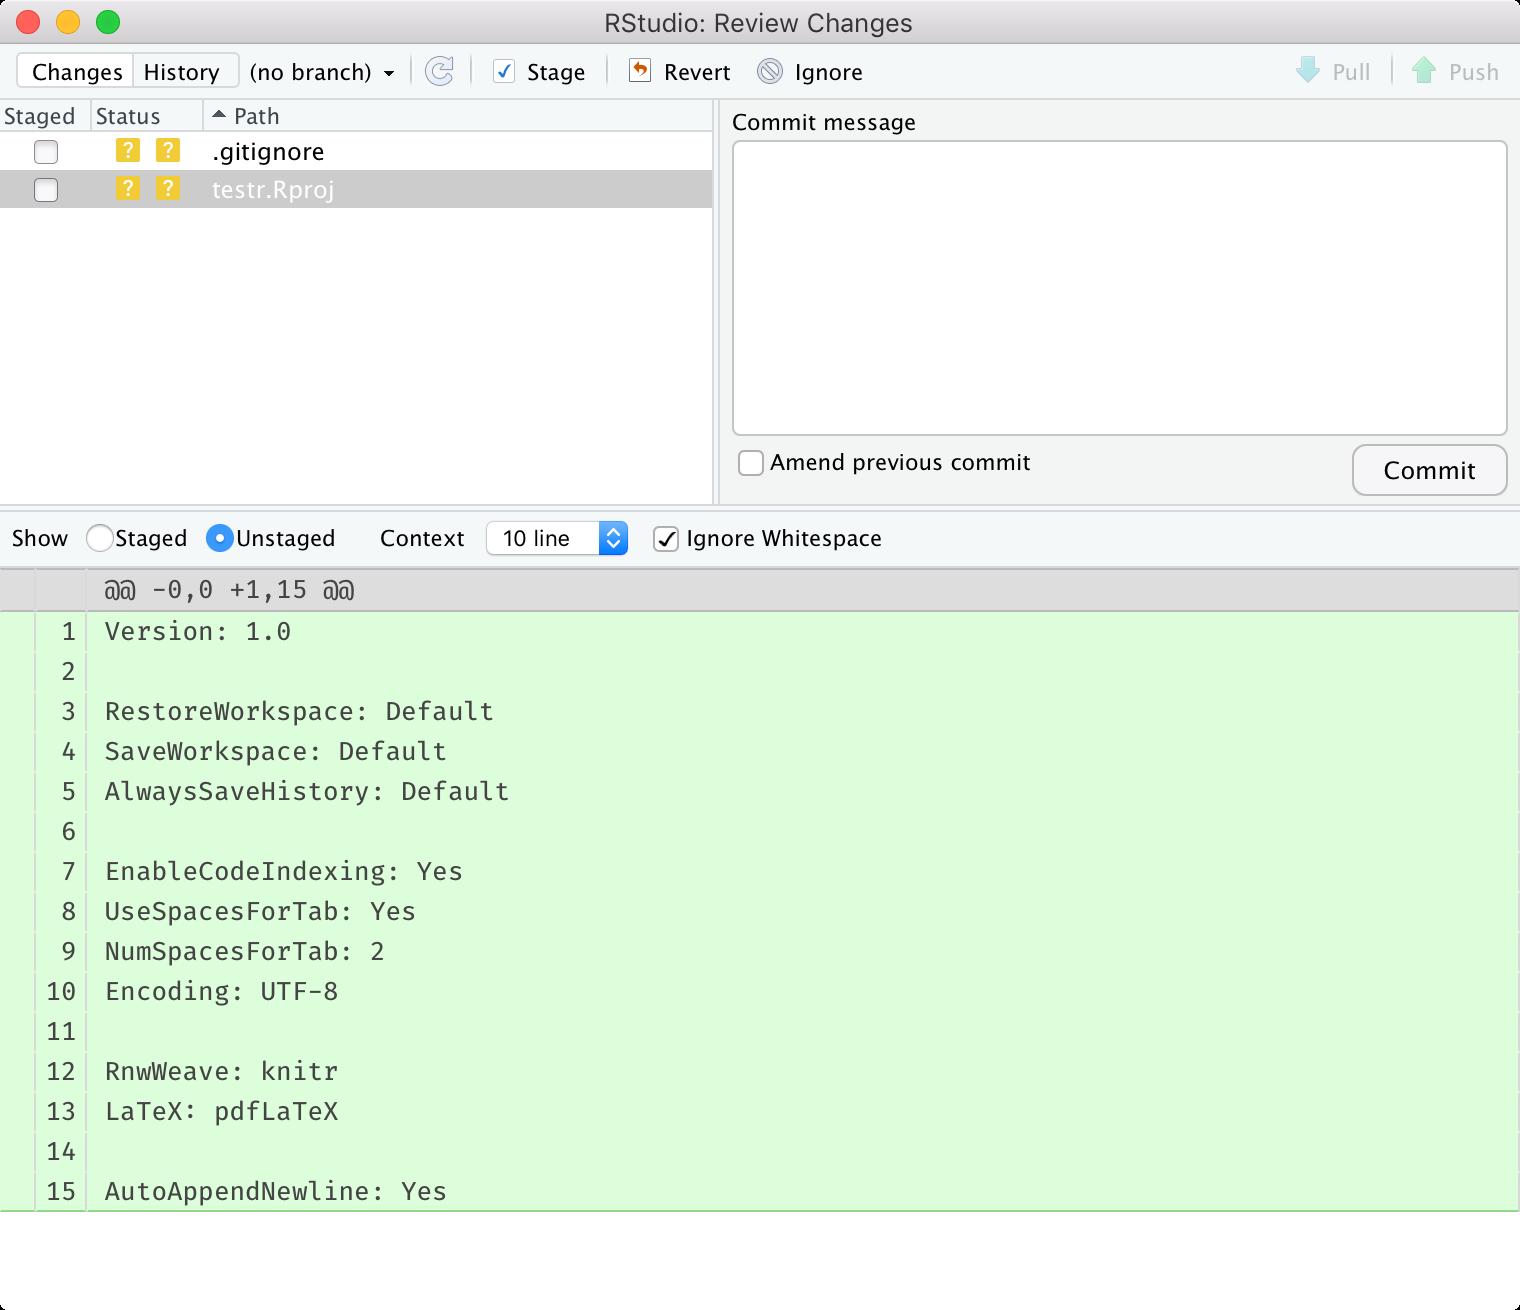 gitタブのDiffボタンを押すと表示される画面。ファイルの中身(変更点)が出力されている